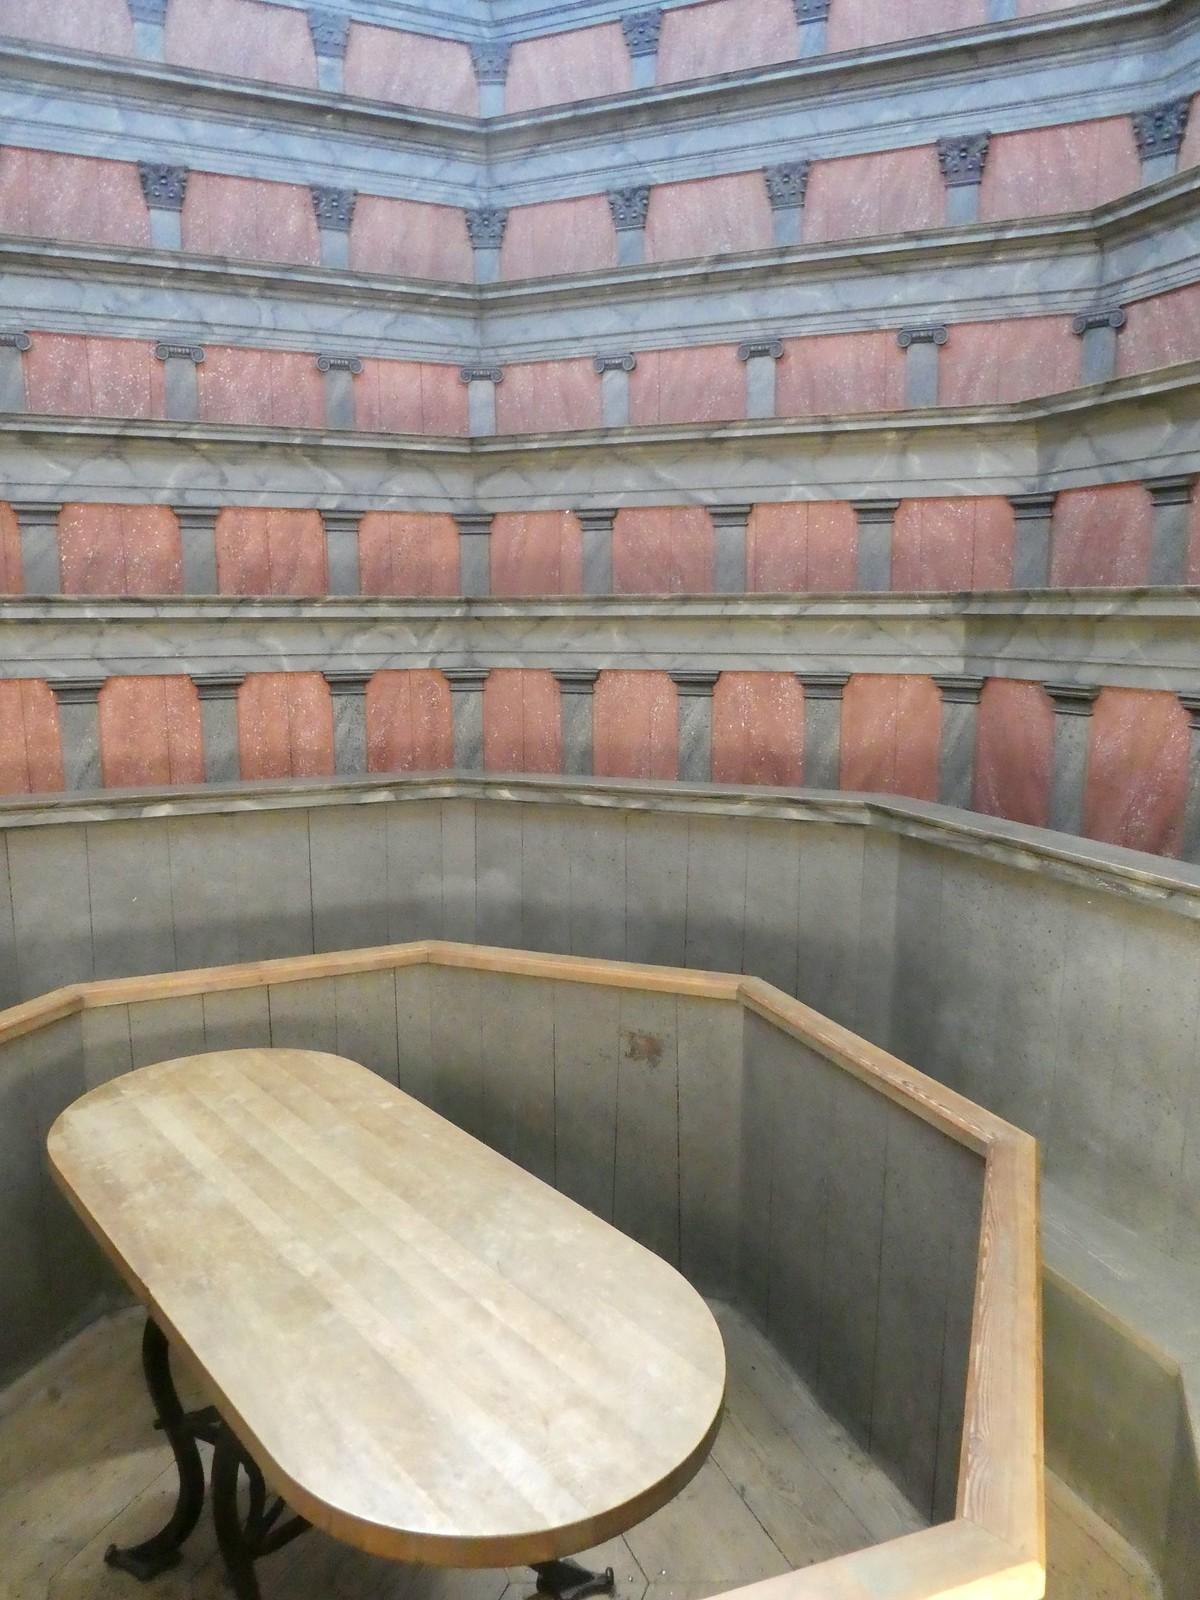 Anatomical Theatre, Gustavianum Museum, Uppsala